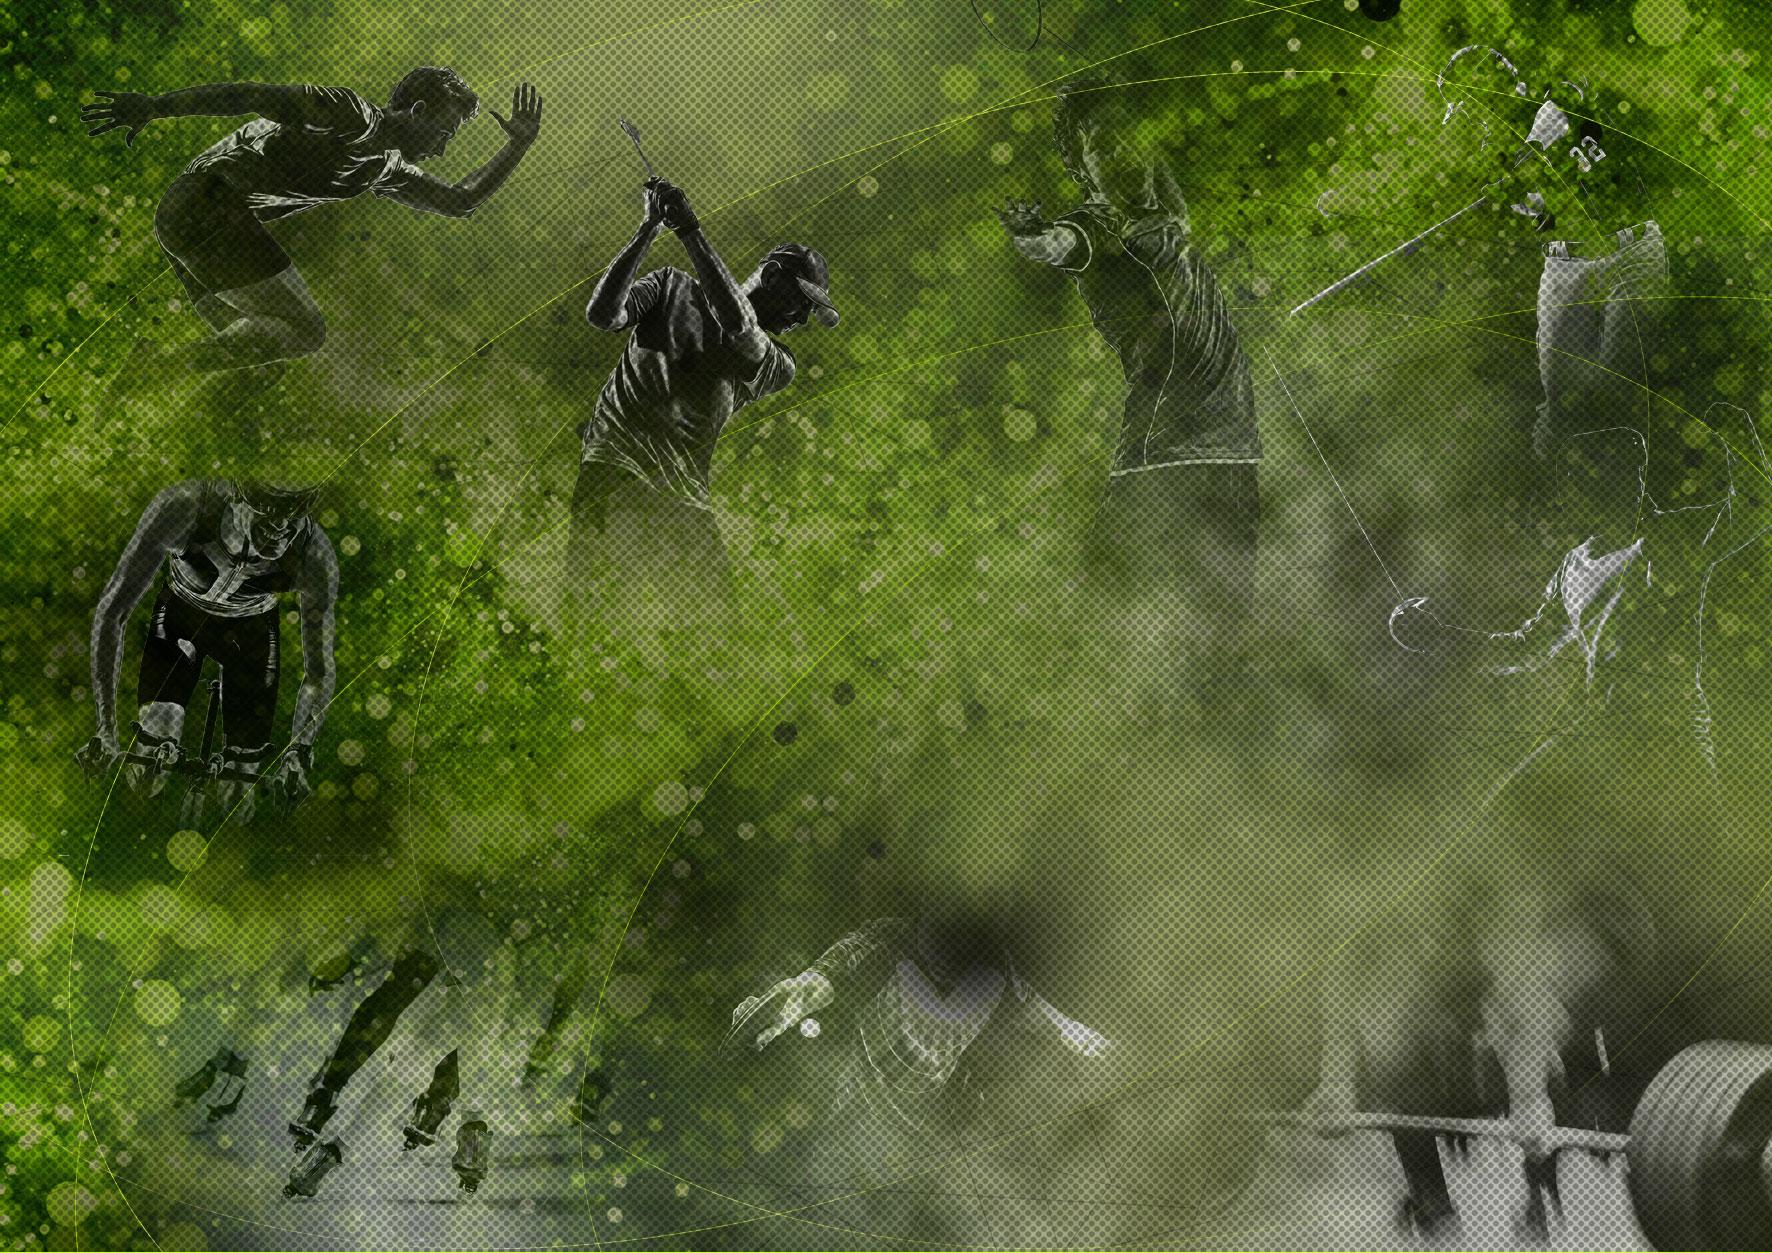 CHRIO USERS クリオを使用している選手